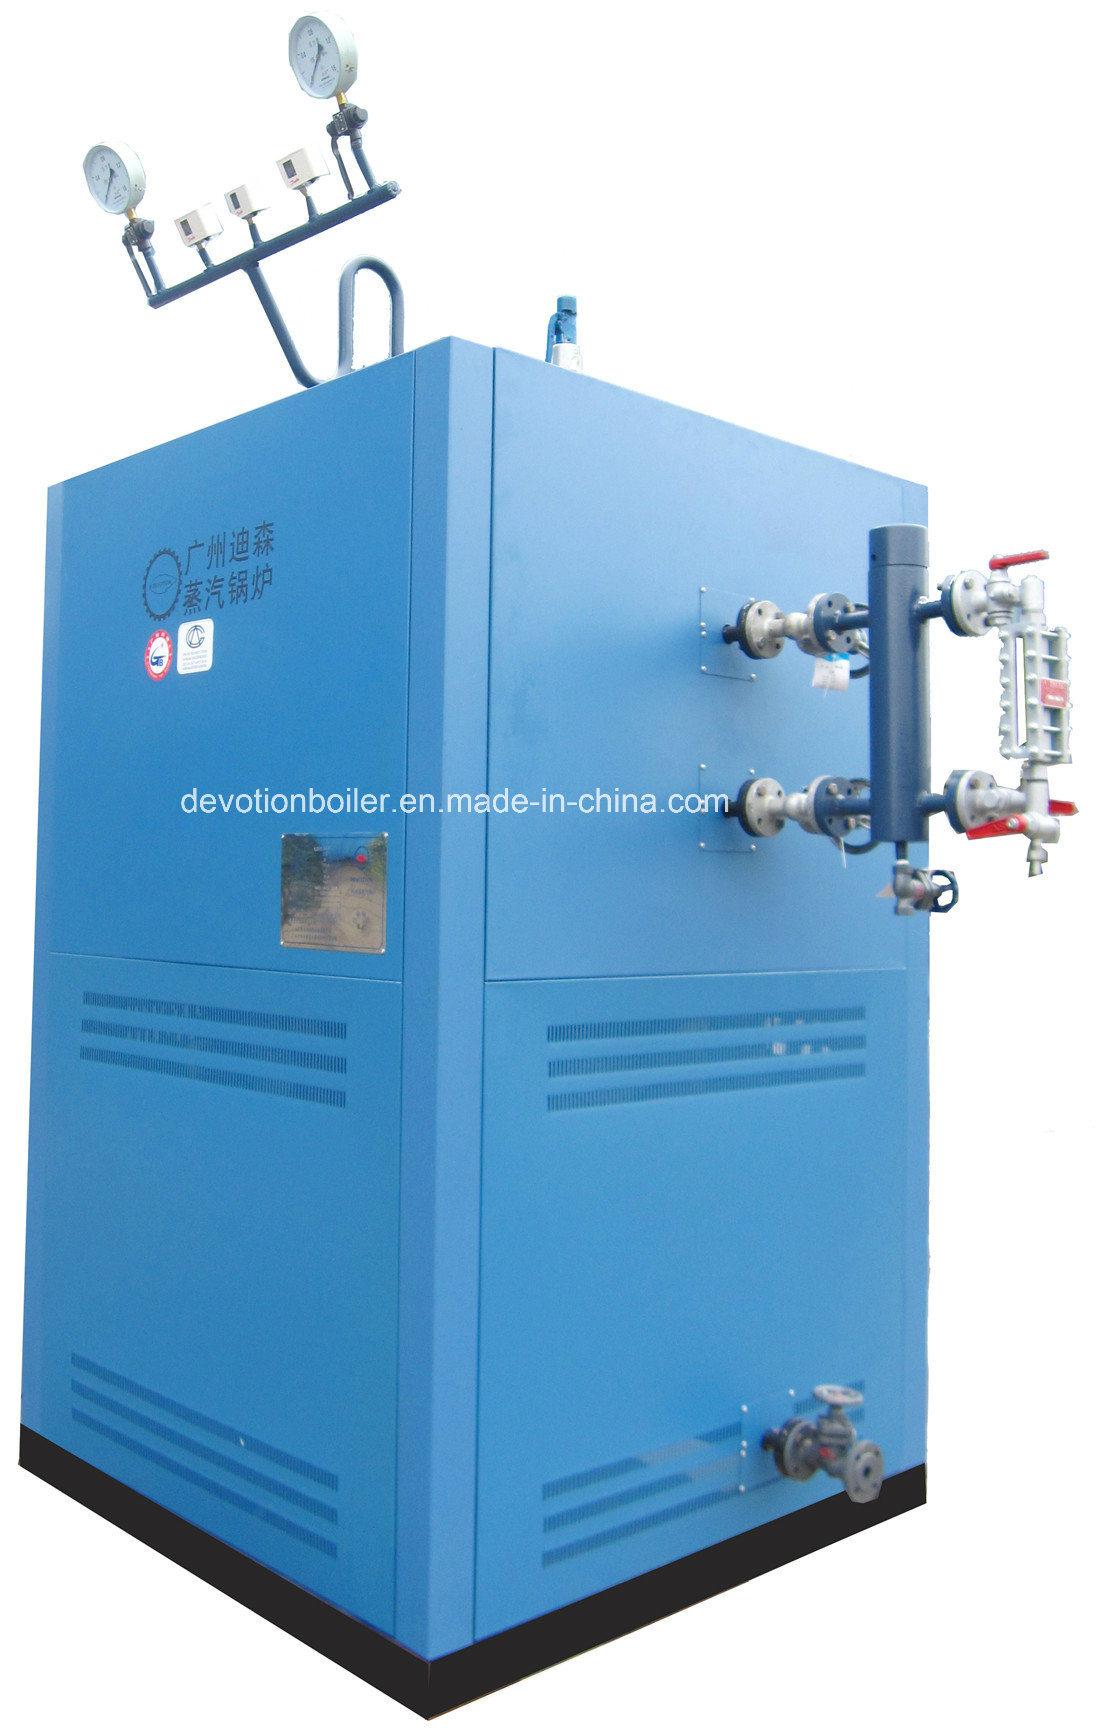 China High Efficiency 500kg/Hr Electric Steam Boiler Photos ...